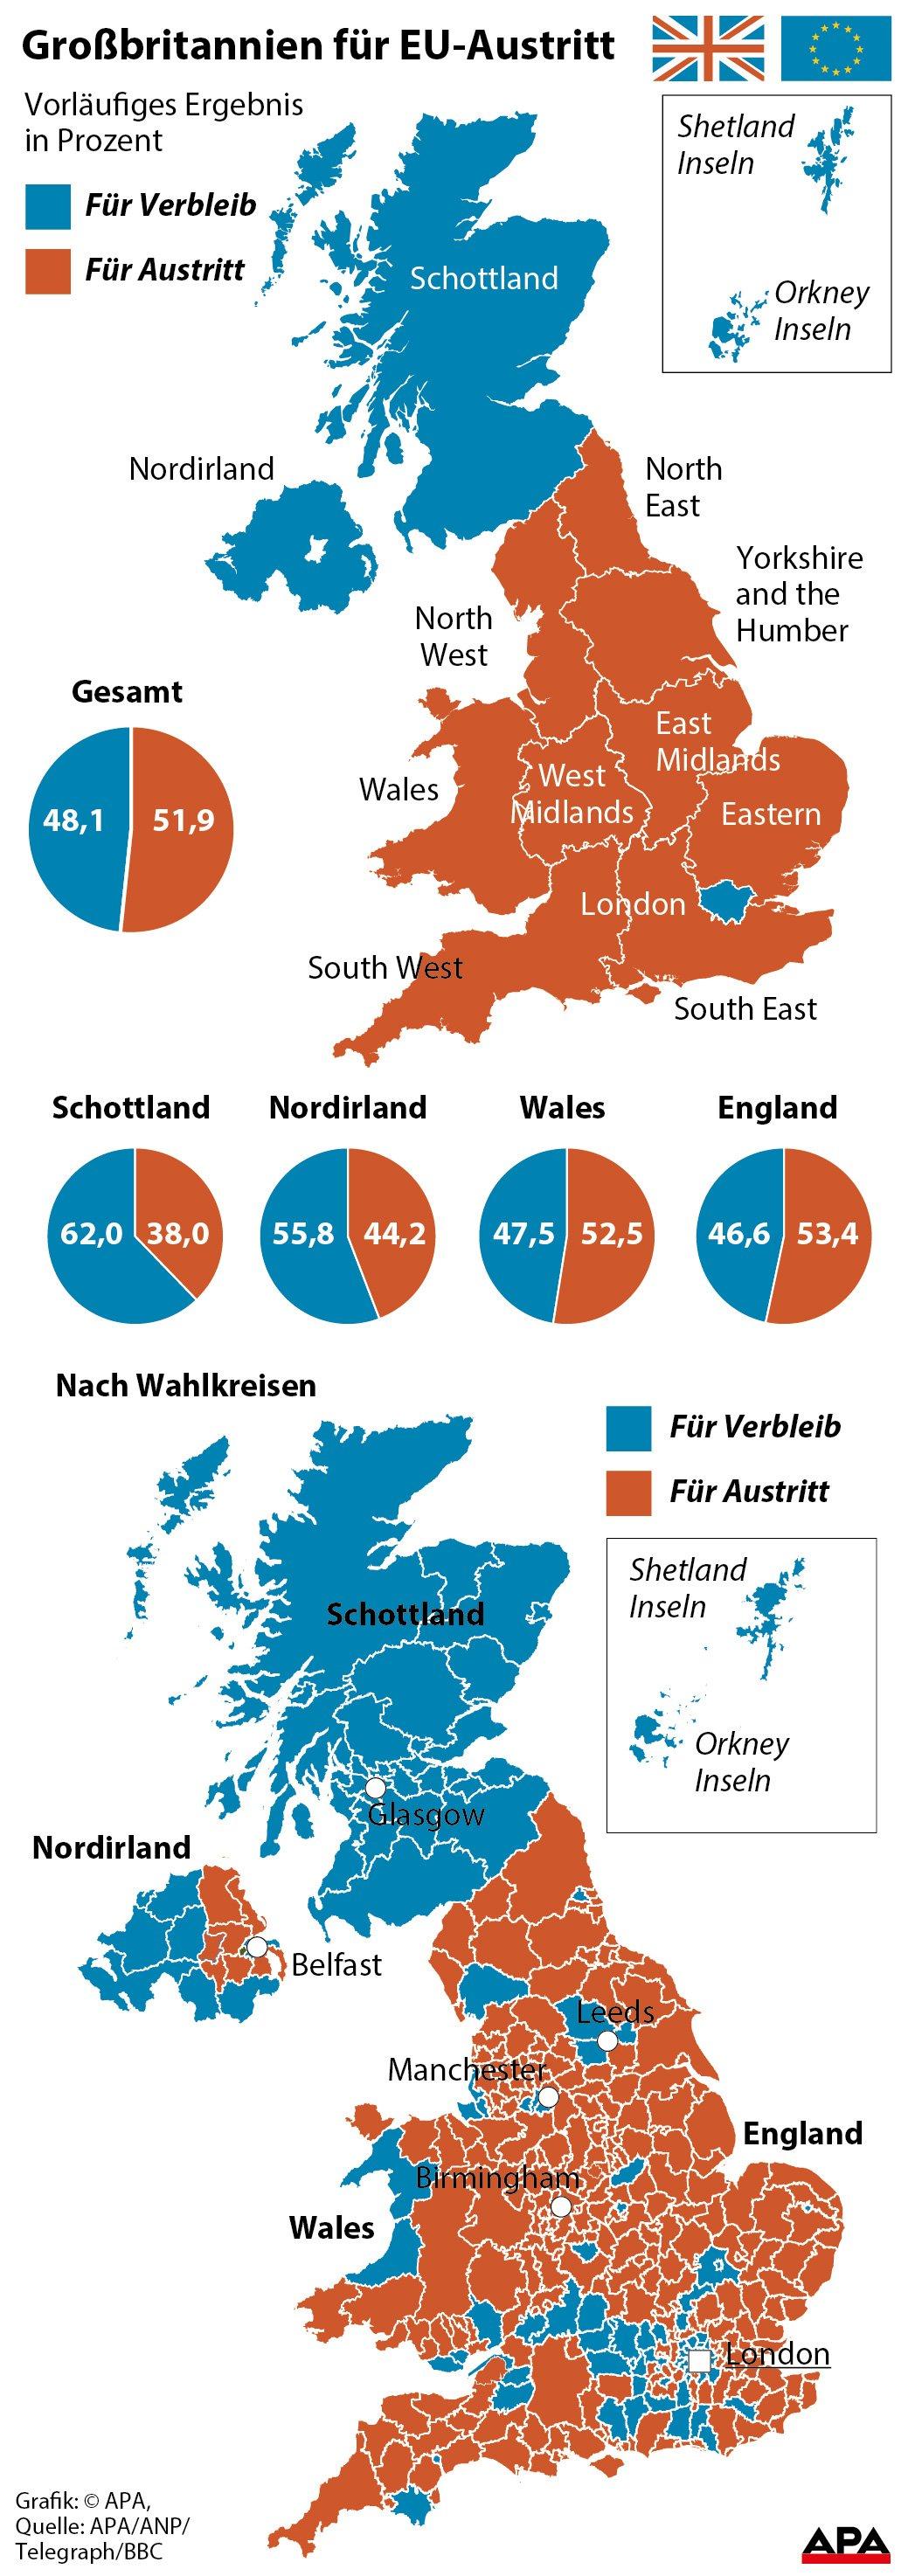 Wales Nordirland Ergebnis